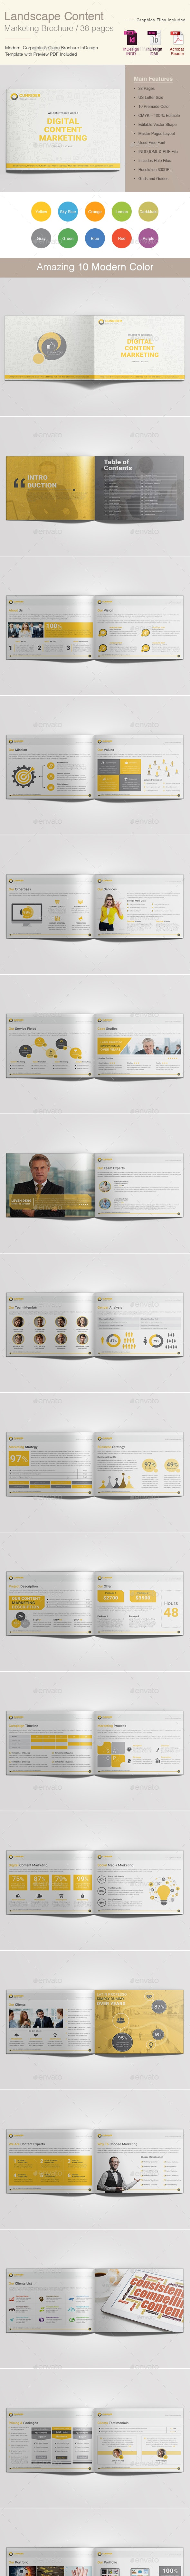 Landscape Content Marketing Brochure - Corporate Brochures